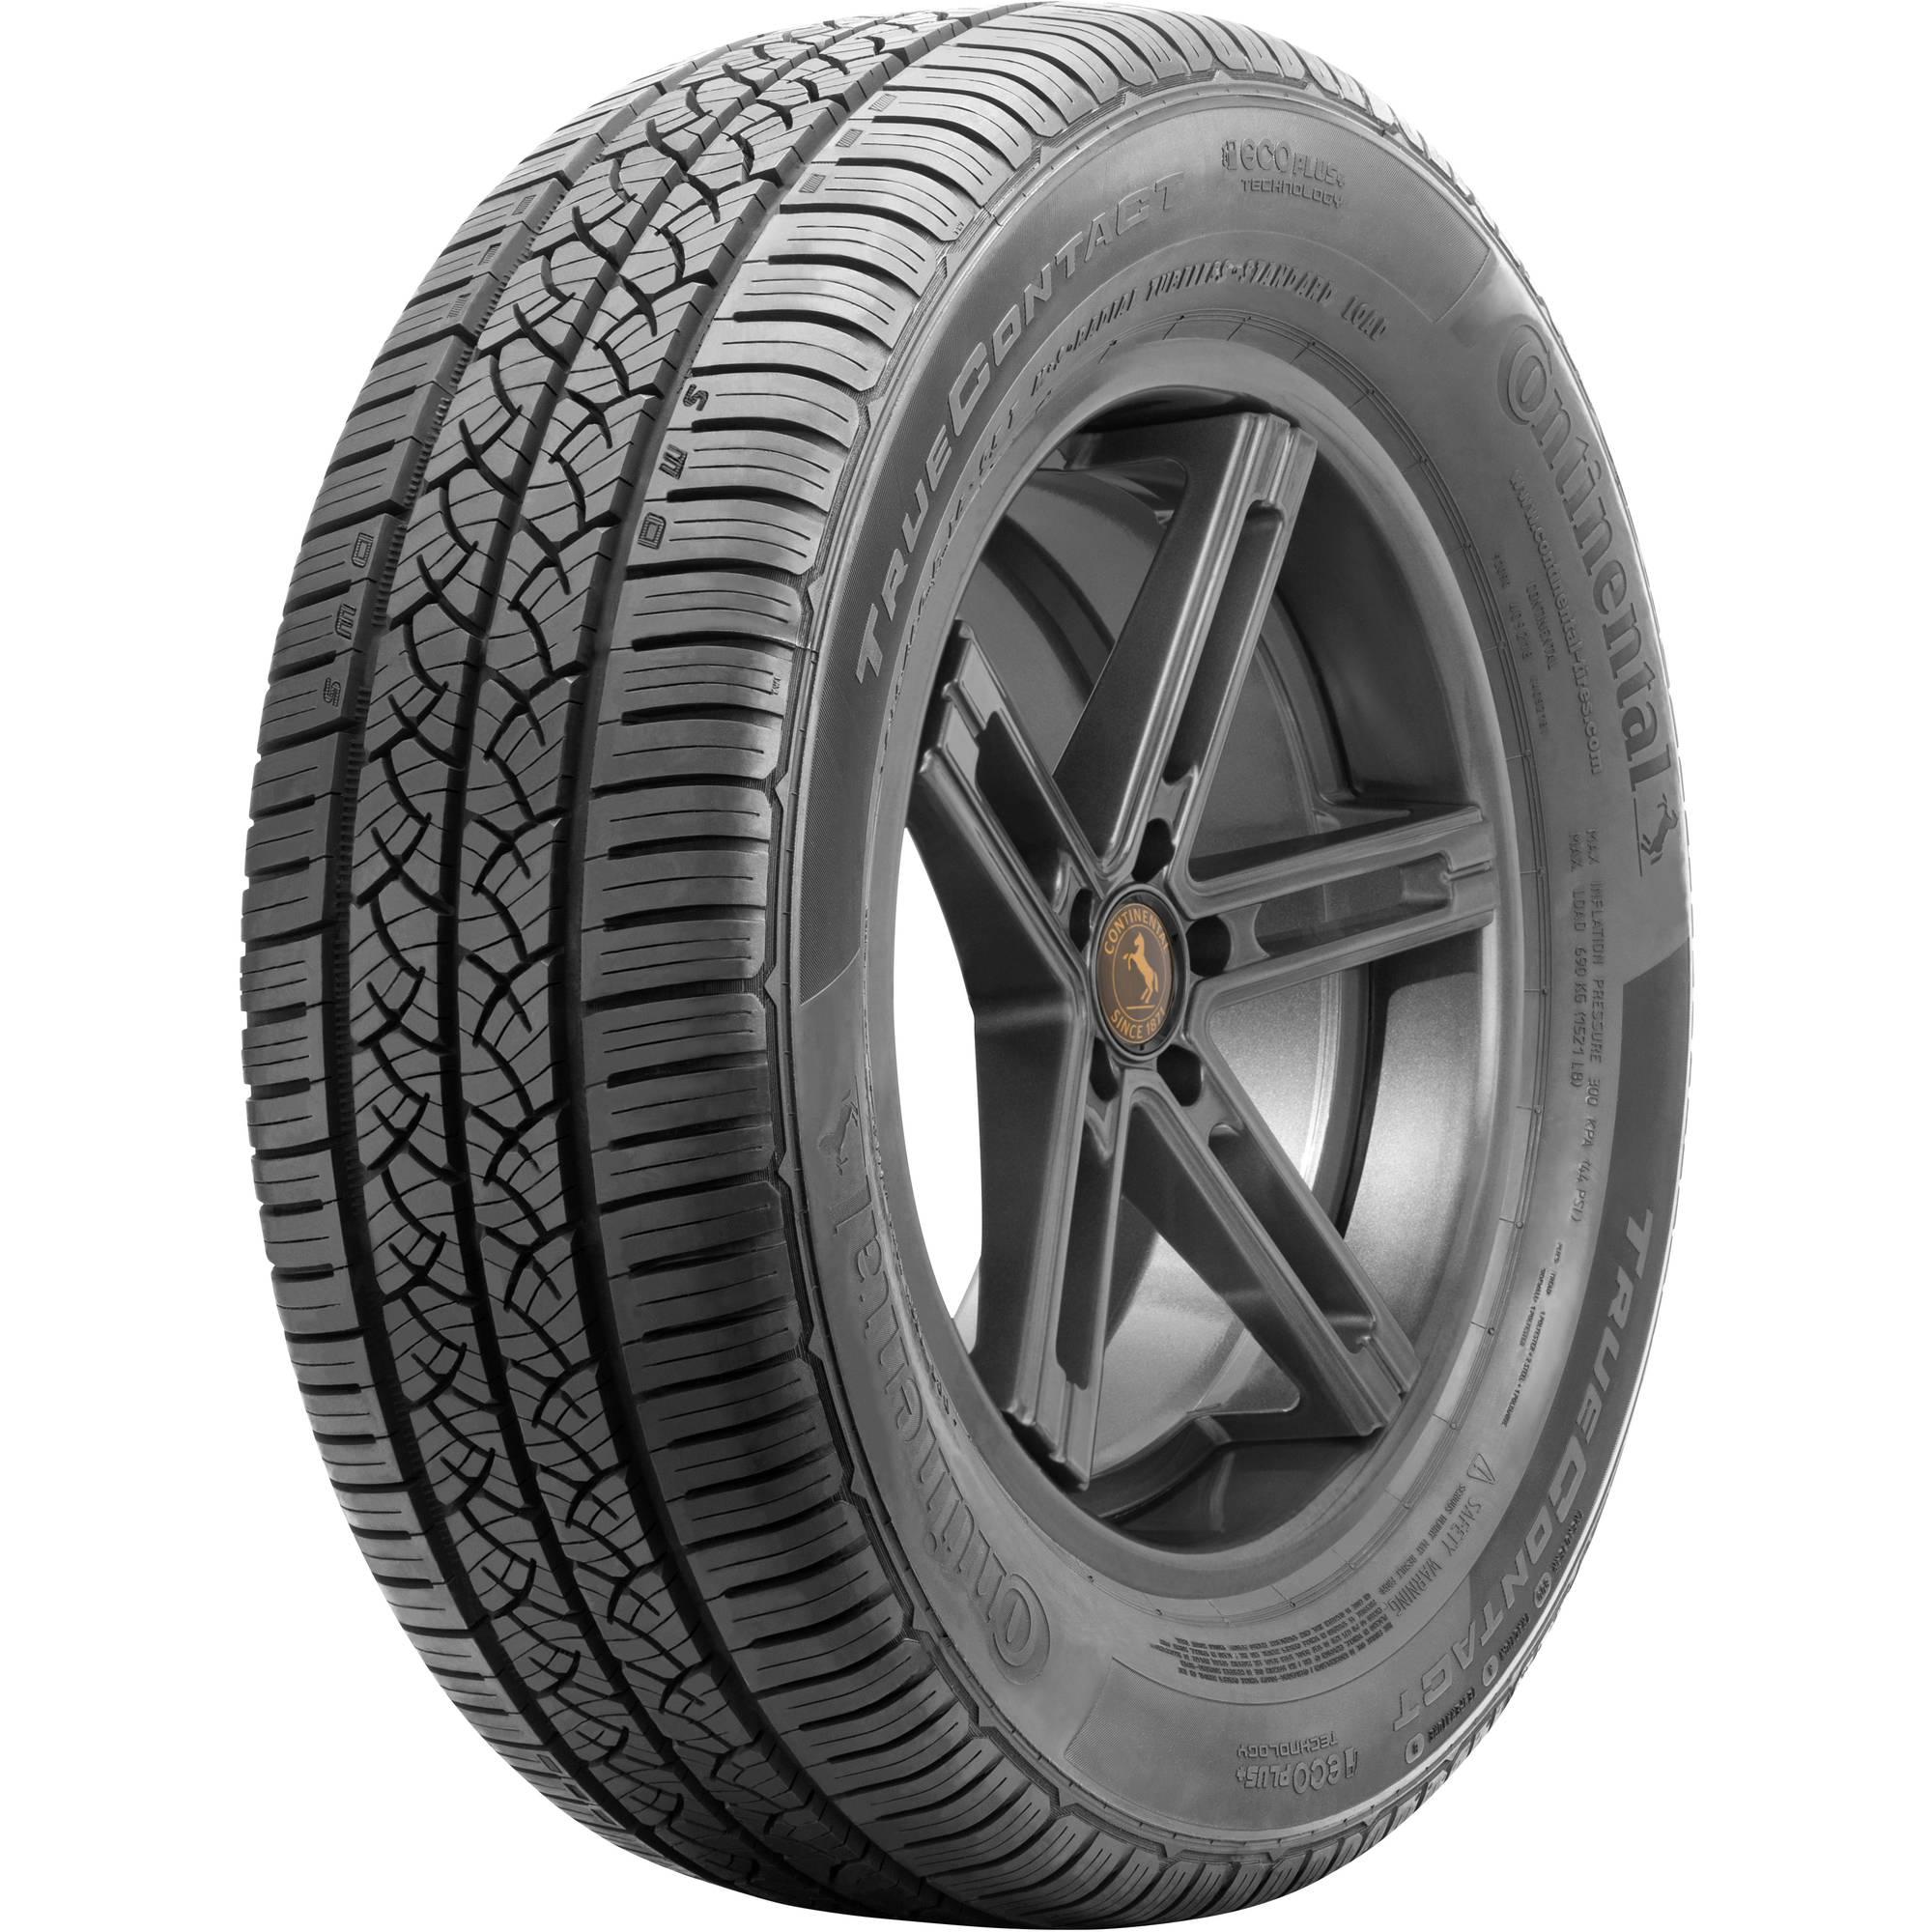 Continental Truecontact Tire 235/60R18 Tire 103T